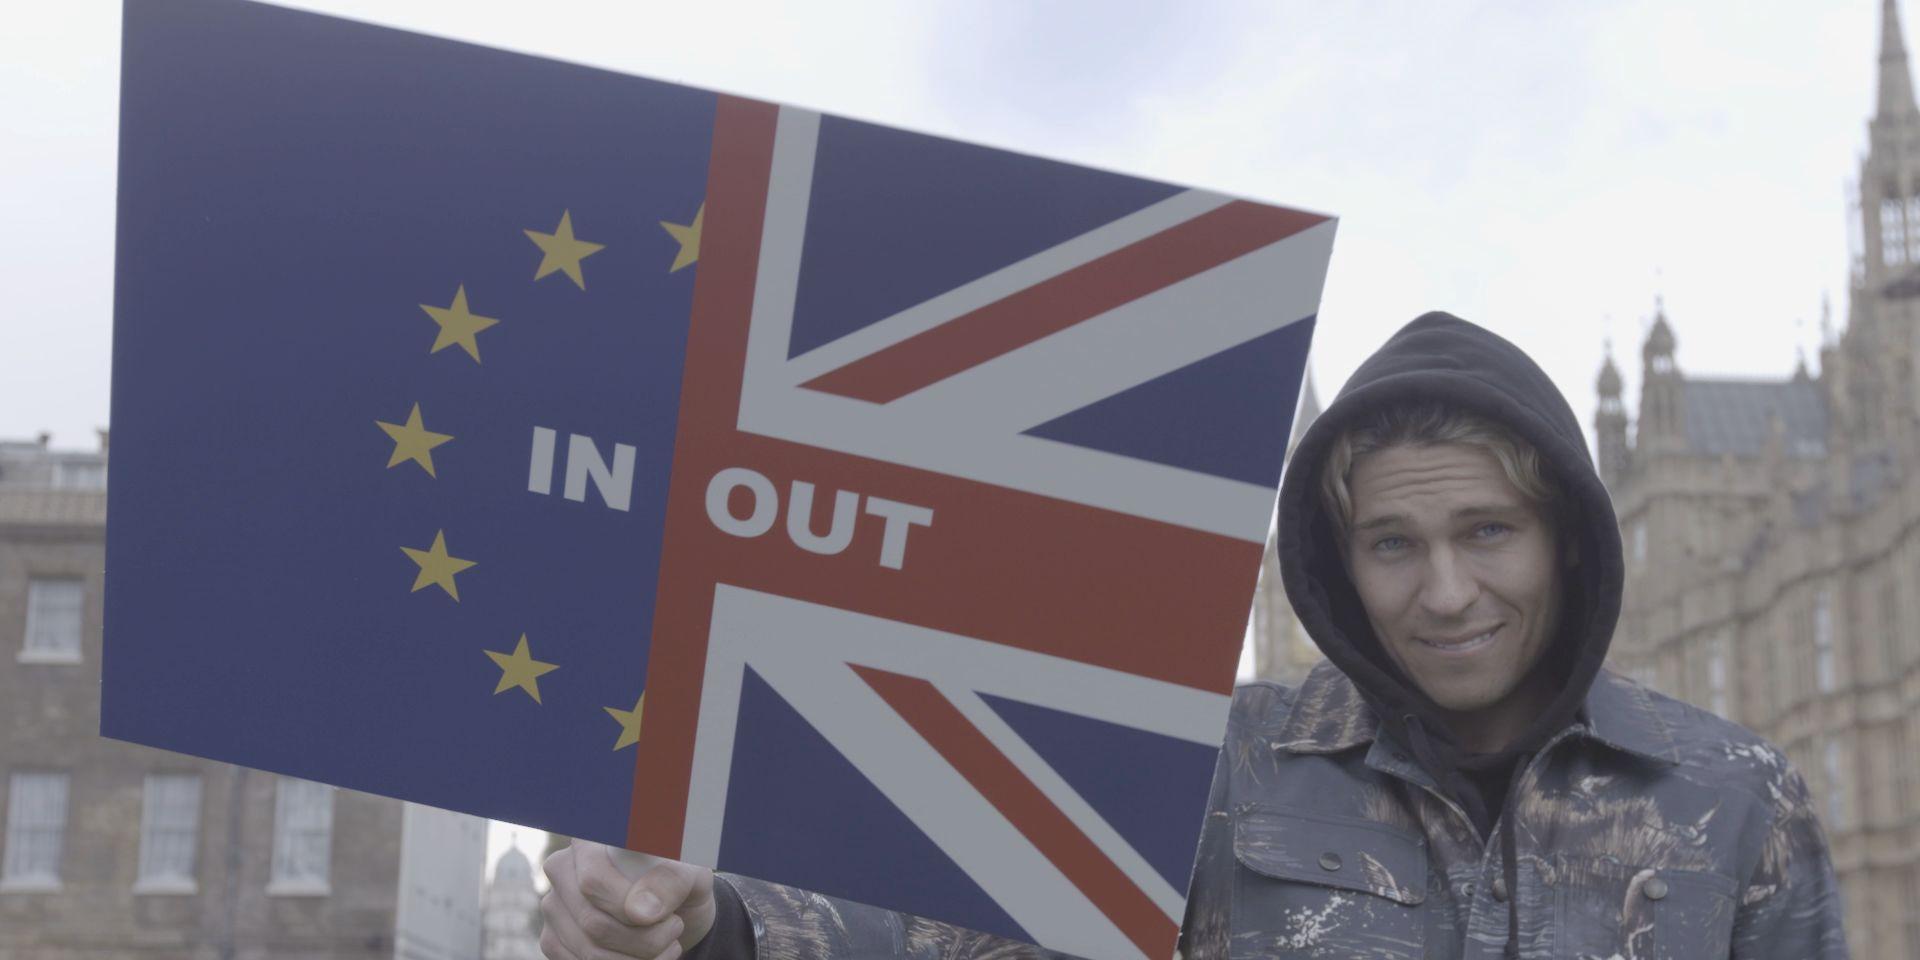 Educating Joey Essex: What EU Sayin?